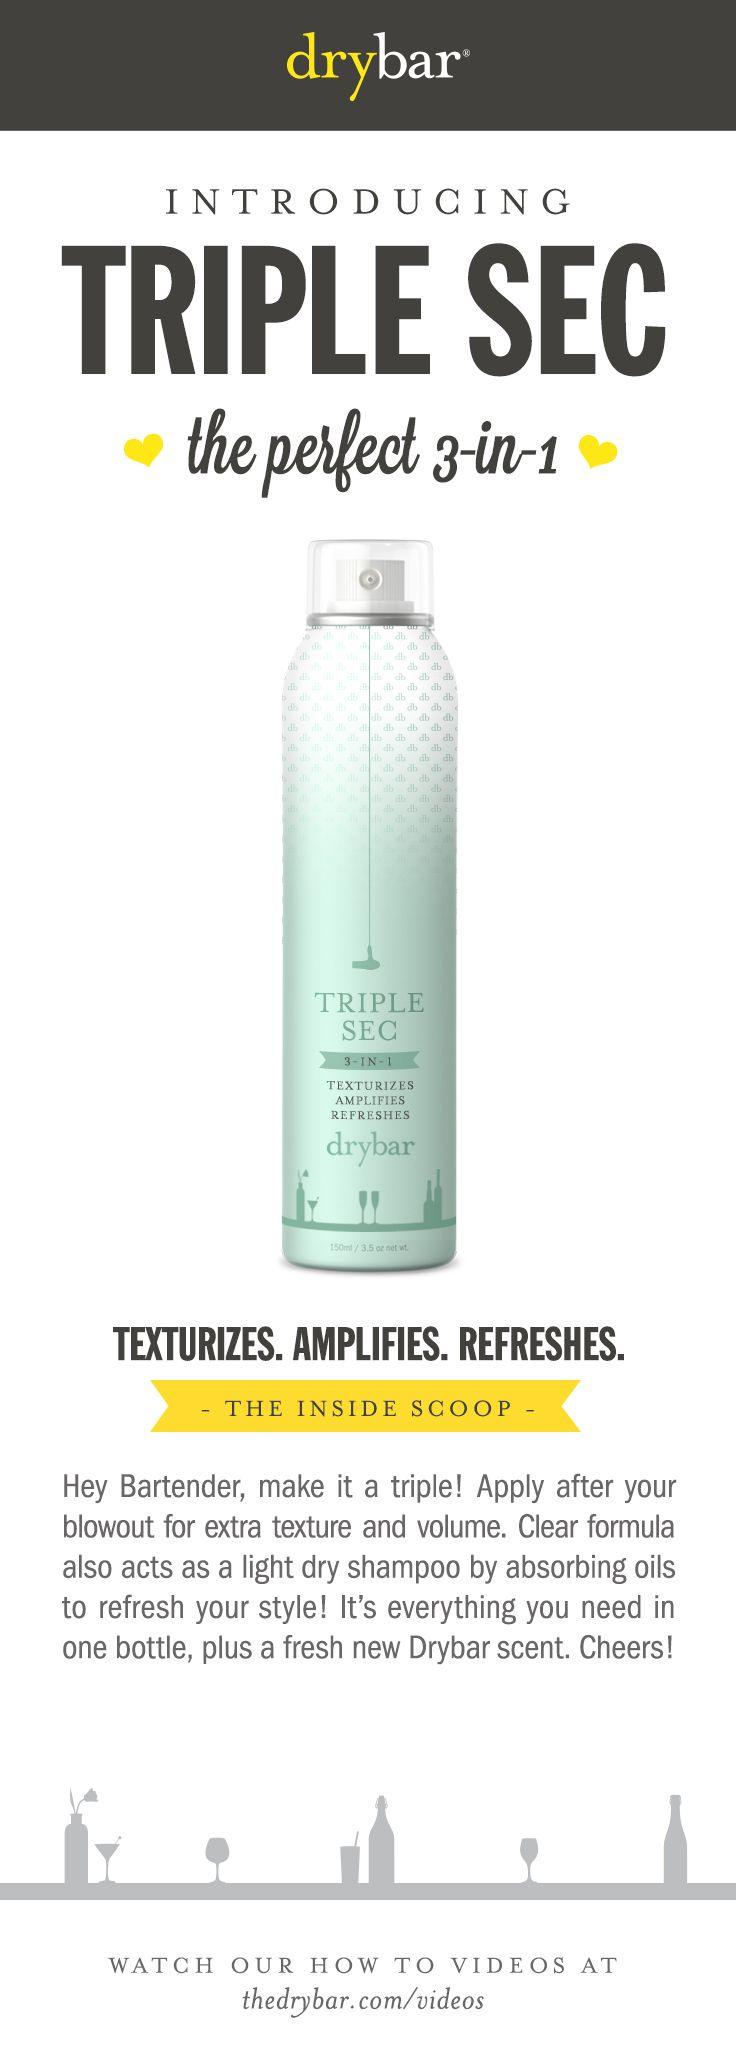 Hair Drybar TripleSec Beauty Sephora Make up Pinterest